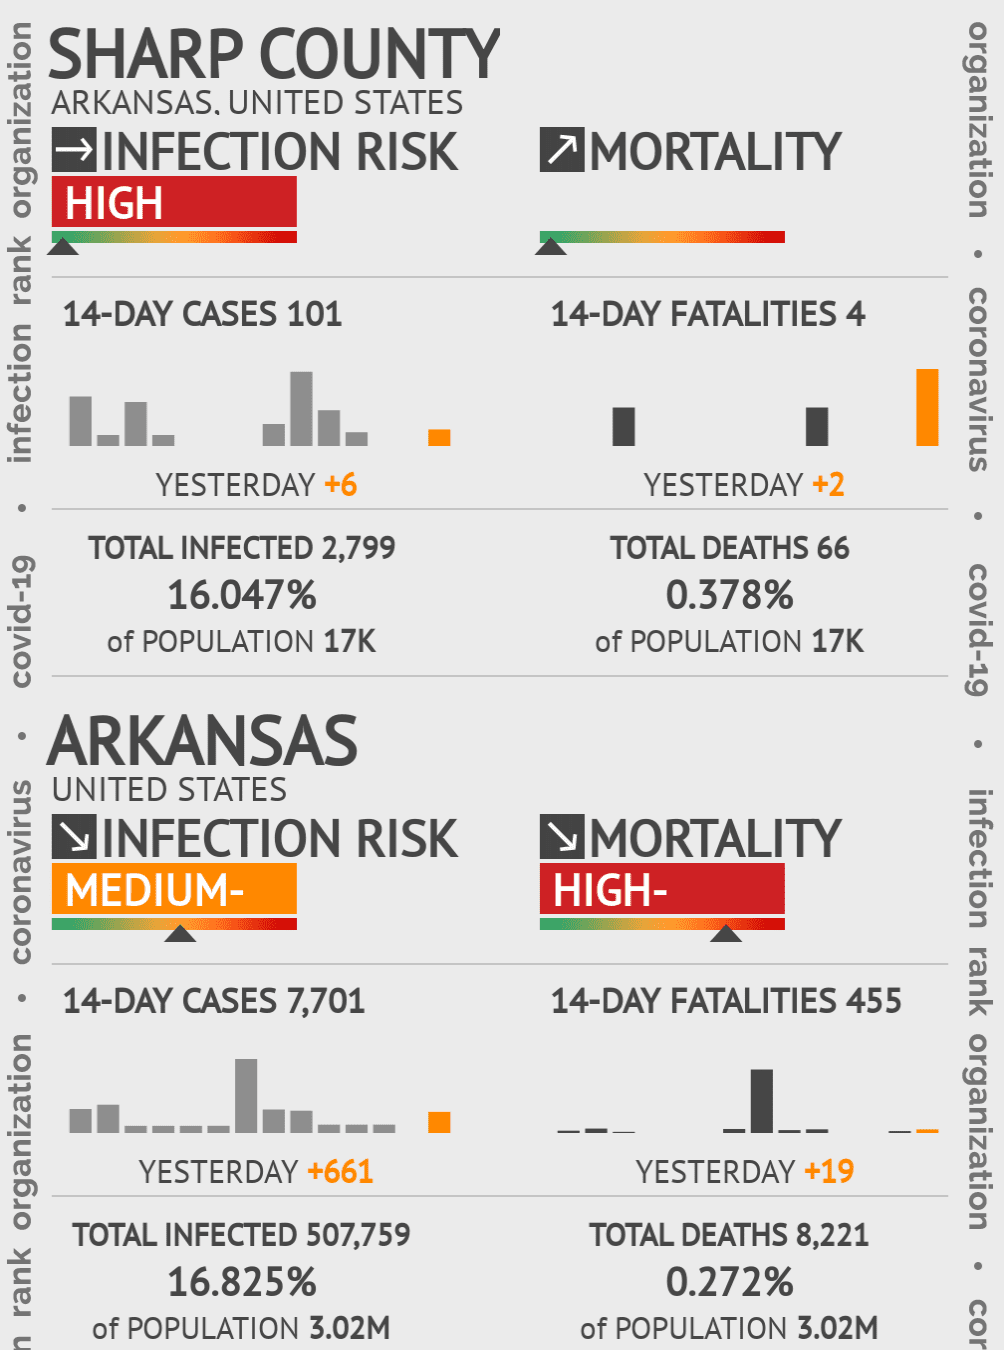 Sharp County Coronavirus Covid-19 Risk of Infection on July 24, 2021